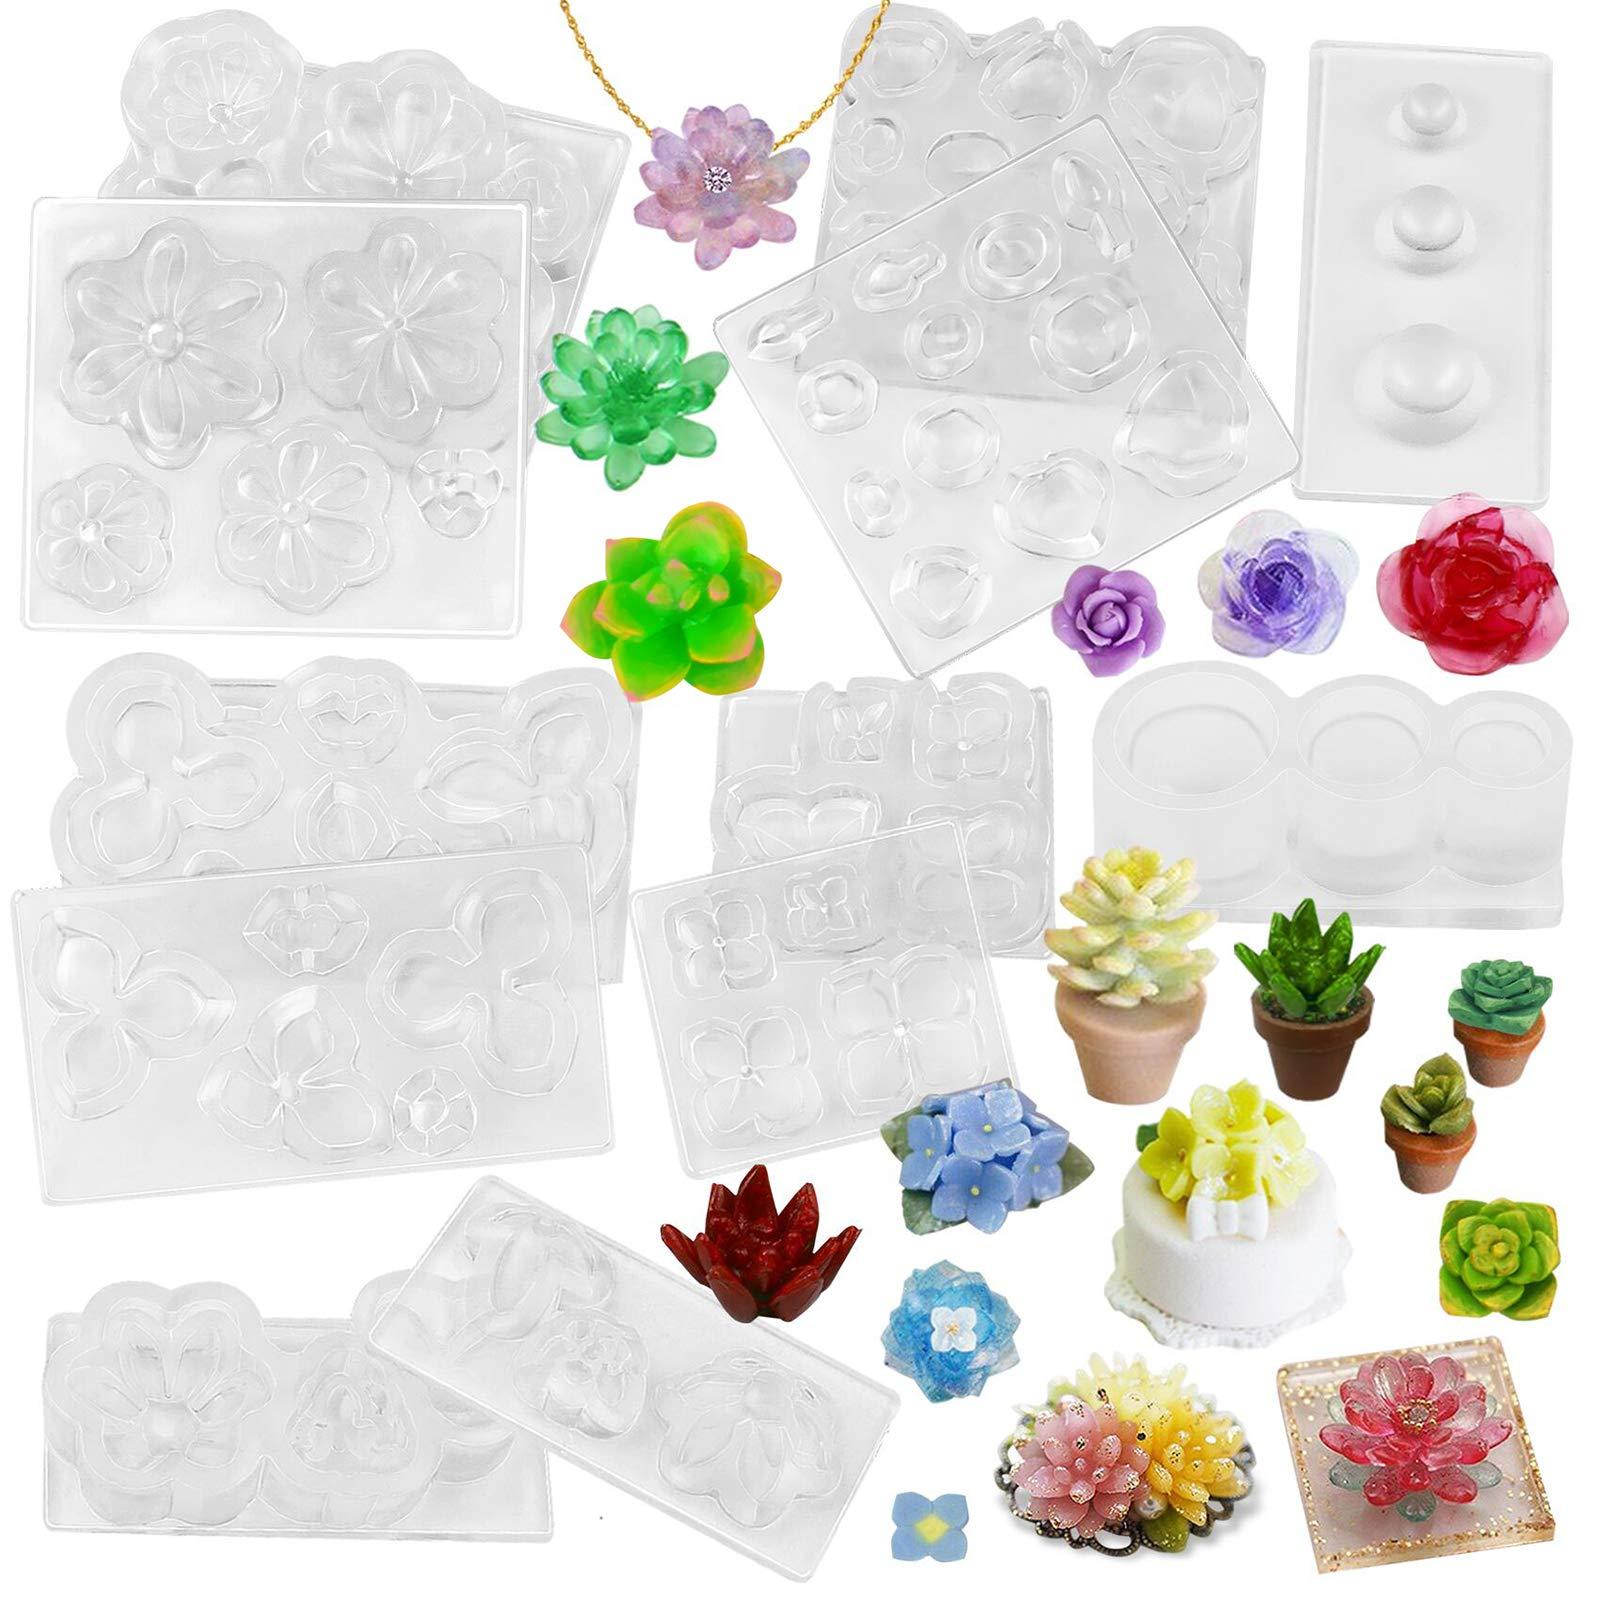 FUNSHOWCASE Miniature Succulent Flower Pot Resin Silicone Molds Set of 6 Mini Trays for Jewelry Casting Bracelet Charm Earrings Pendant Ring Ornament